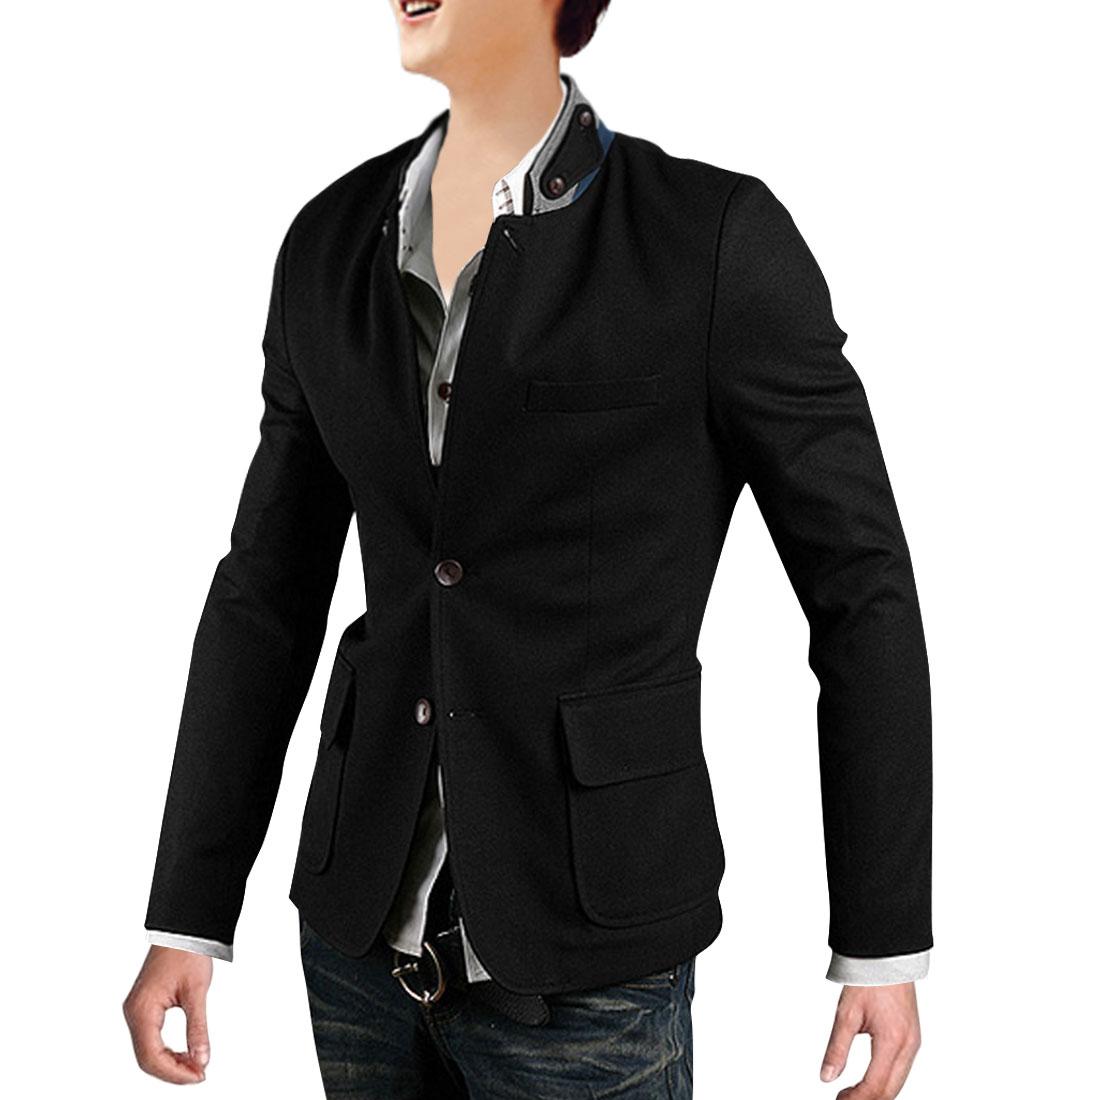 Men Convertible Collar Button Up Blazer Black M